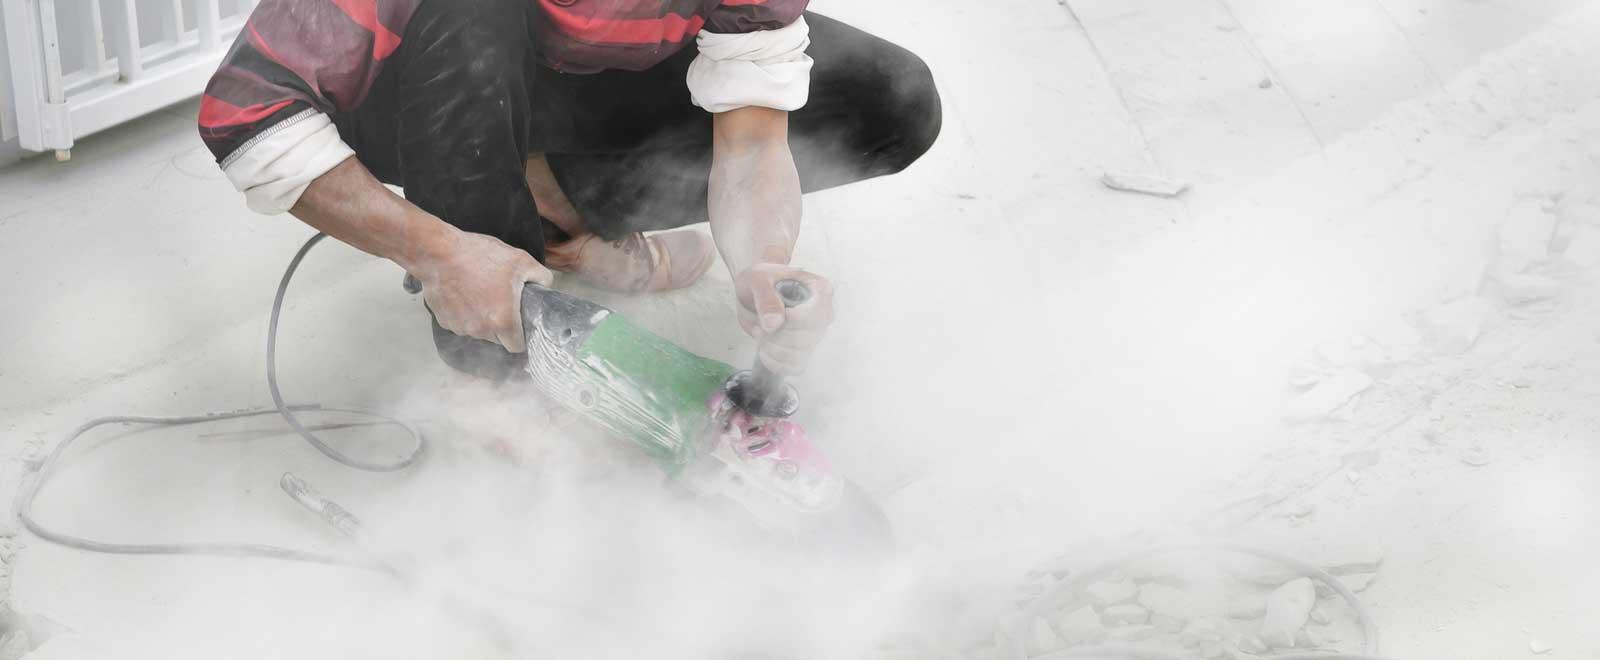 Grinding Concrete Silica Dust